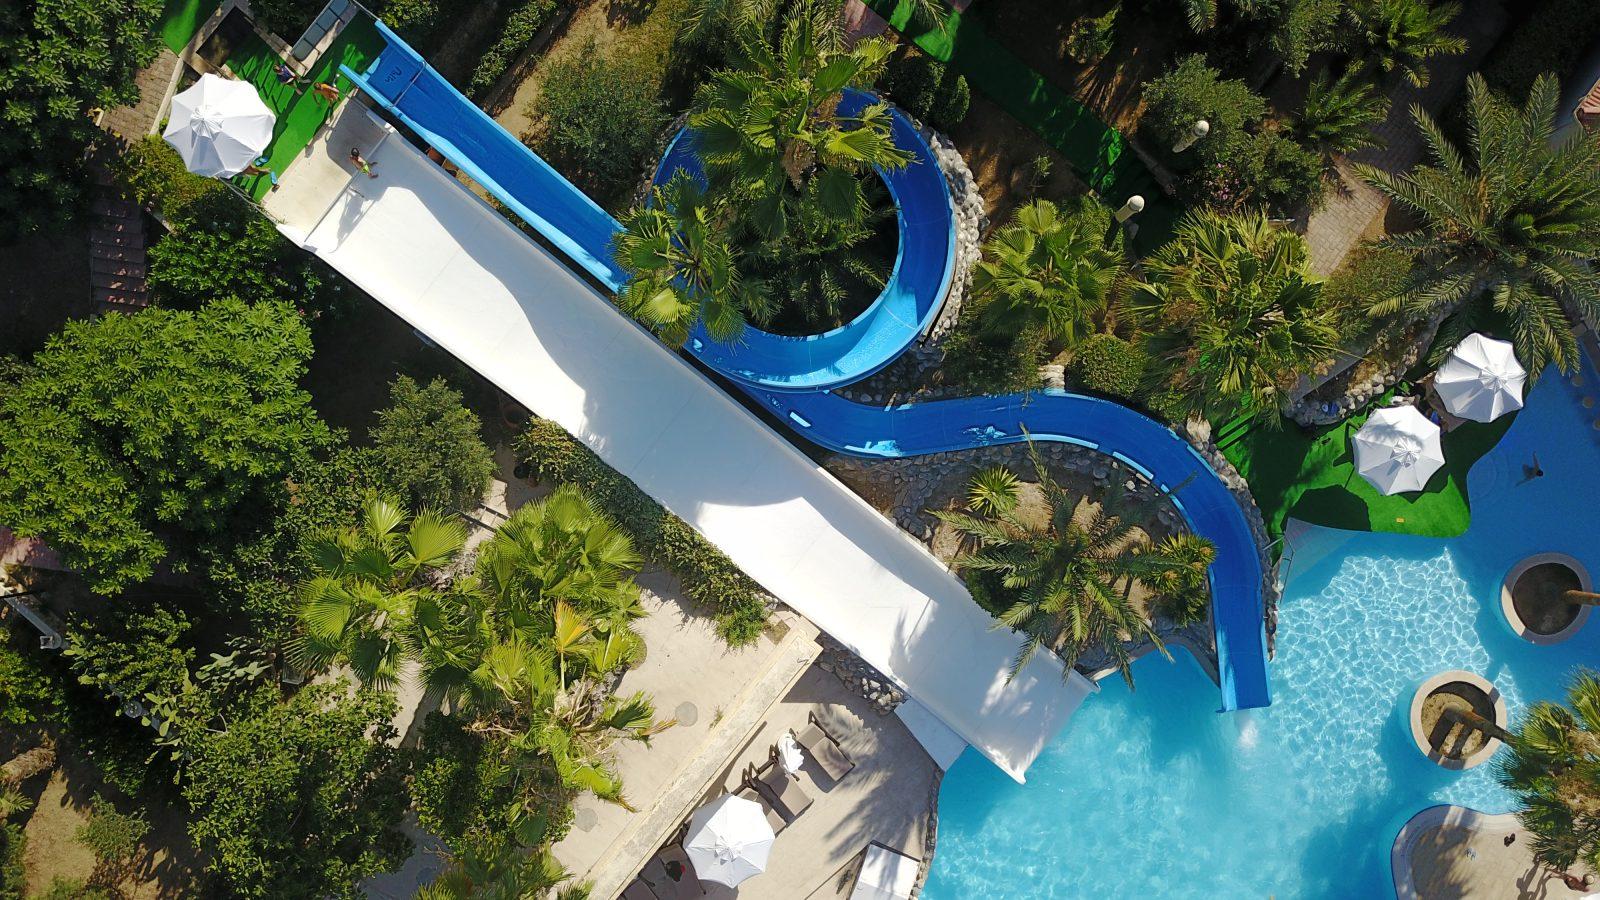 aquaparkwaterslides